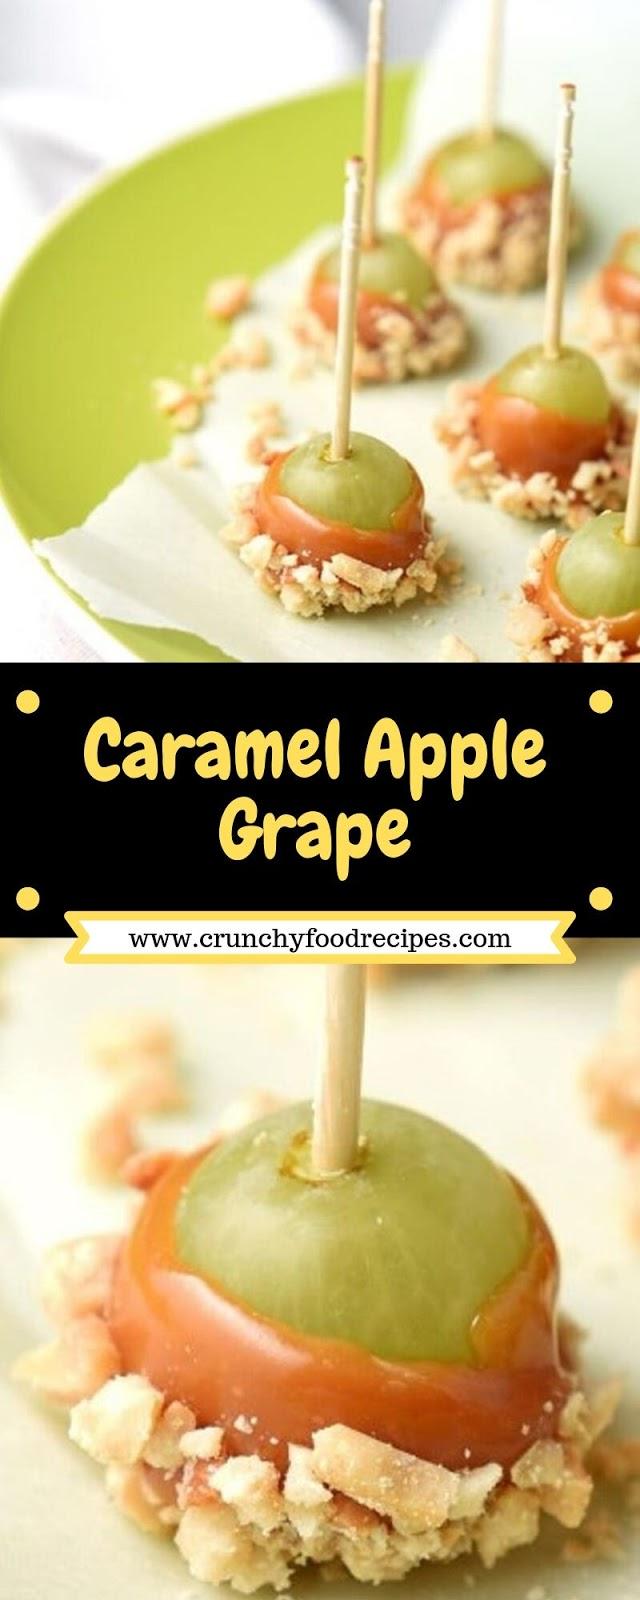 Caramel Apple Grape